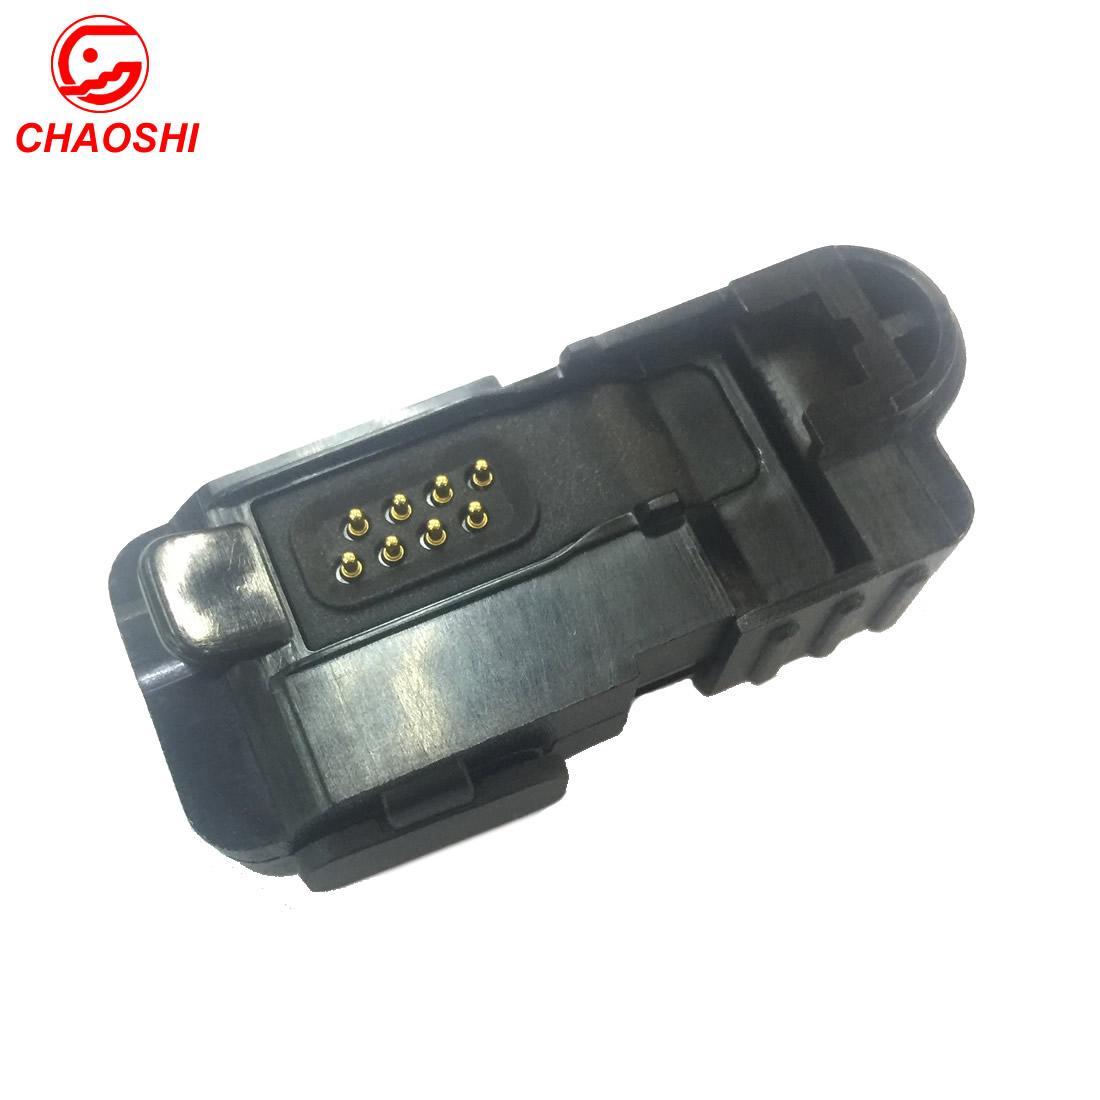 Audio adaptor for DEP550, XPR3550, DP2400 2